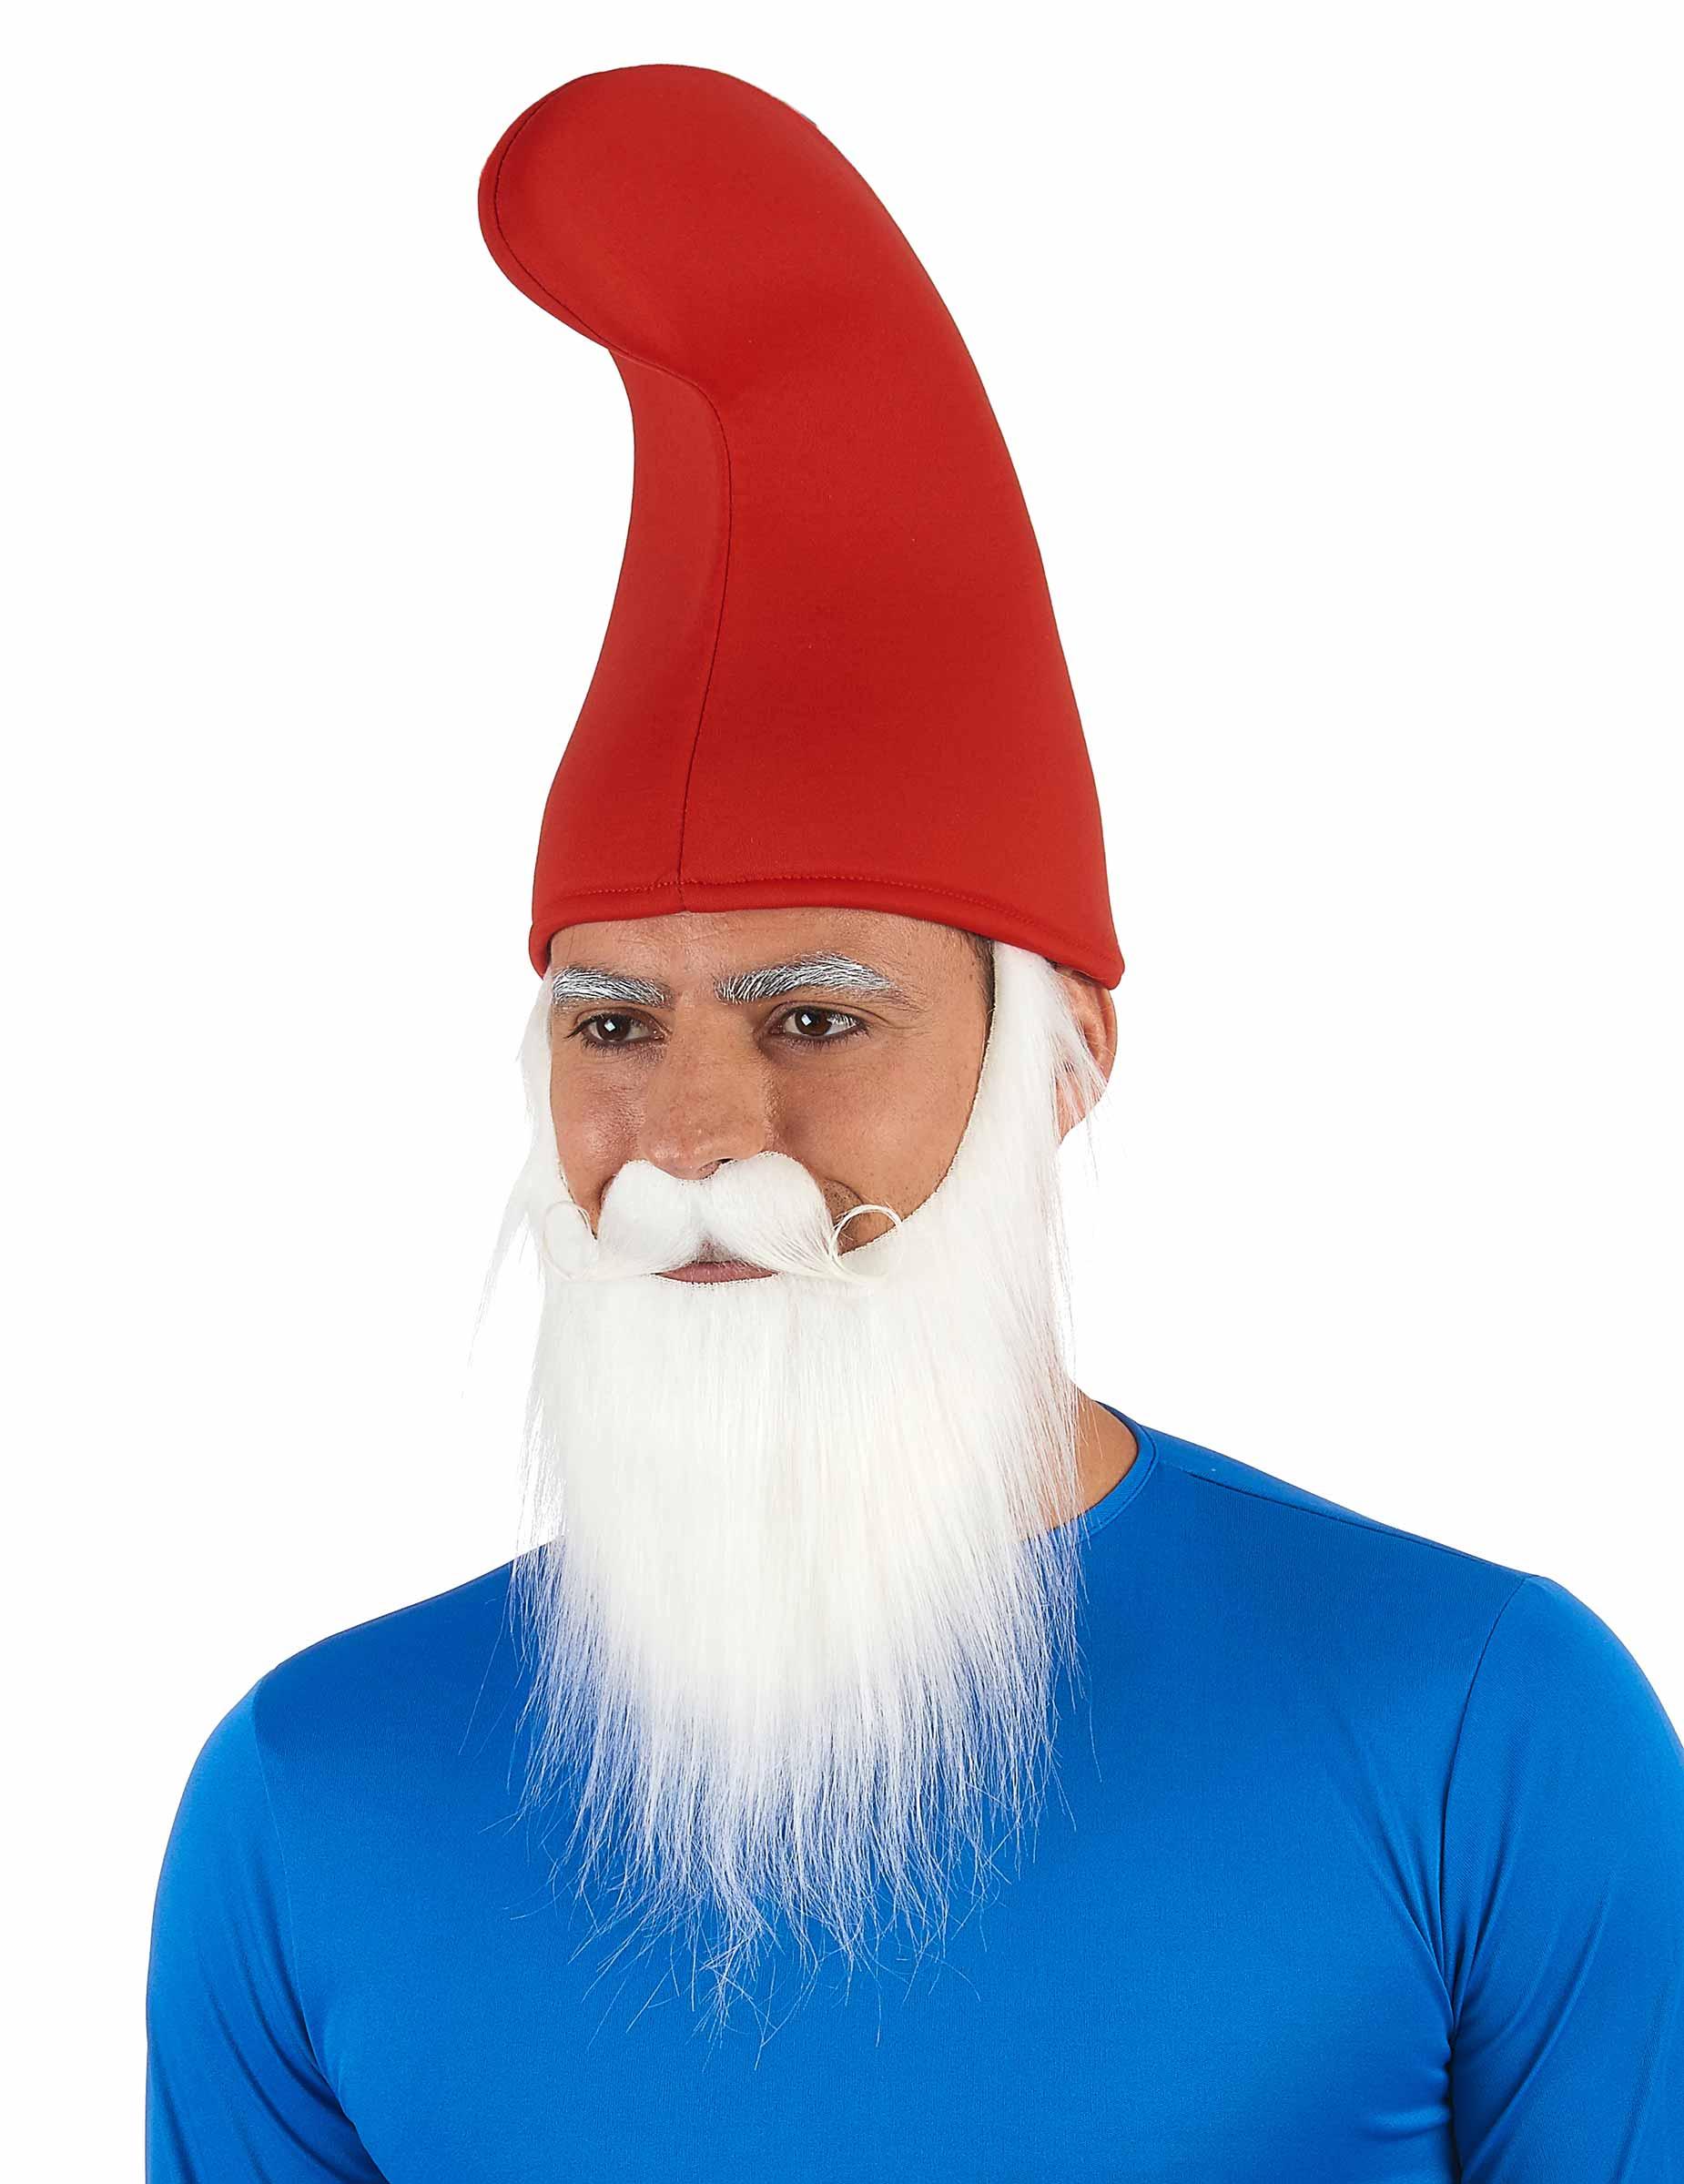 Gorro rojo de duende para adulto  Sombreros 7b9cb5450fe